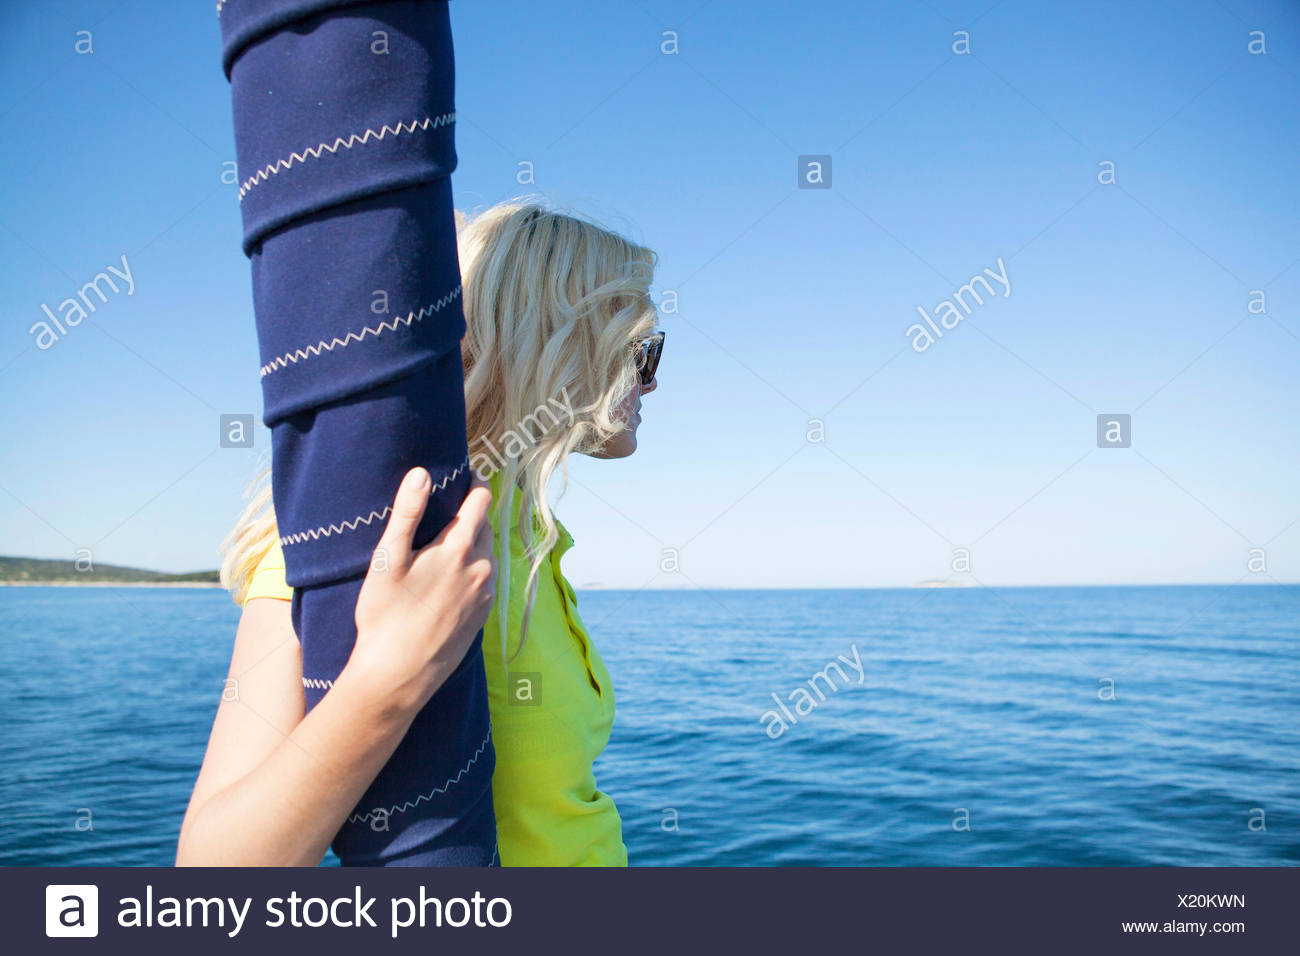 Woman overlooking seascape. Adriatic Sea - Stock Image